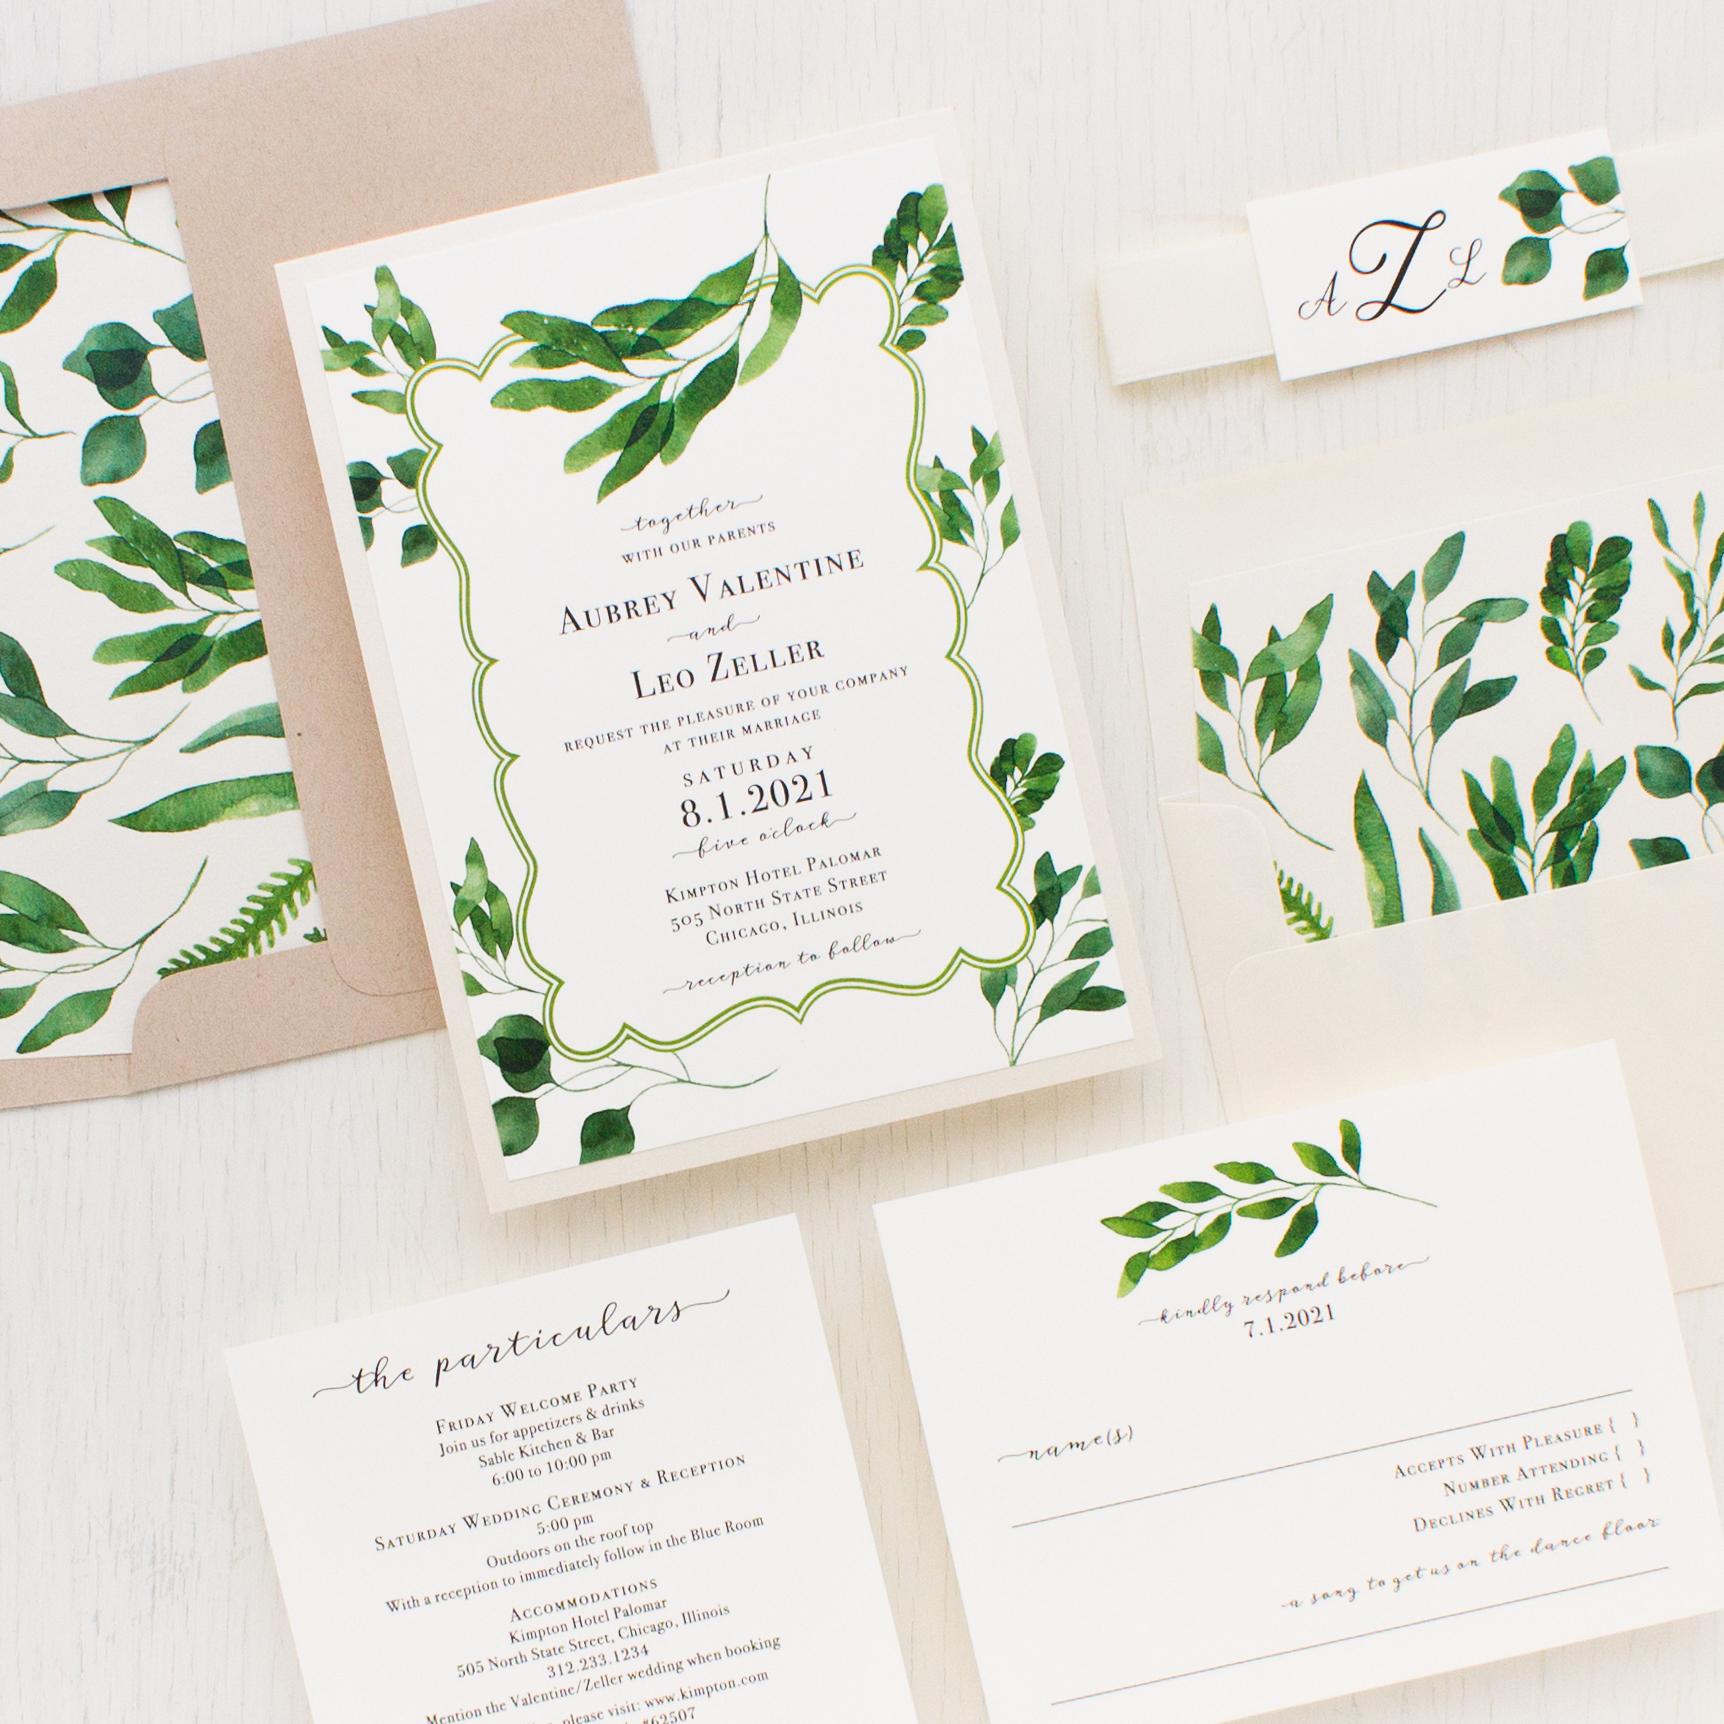 Eucalyptus Green Wedding Invitations   Beacon Lane